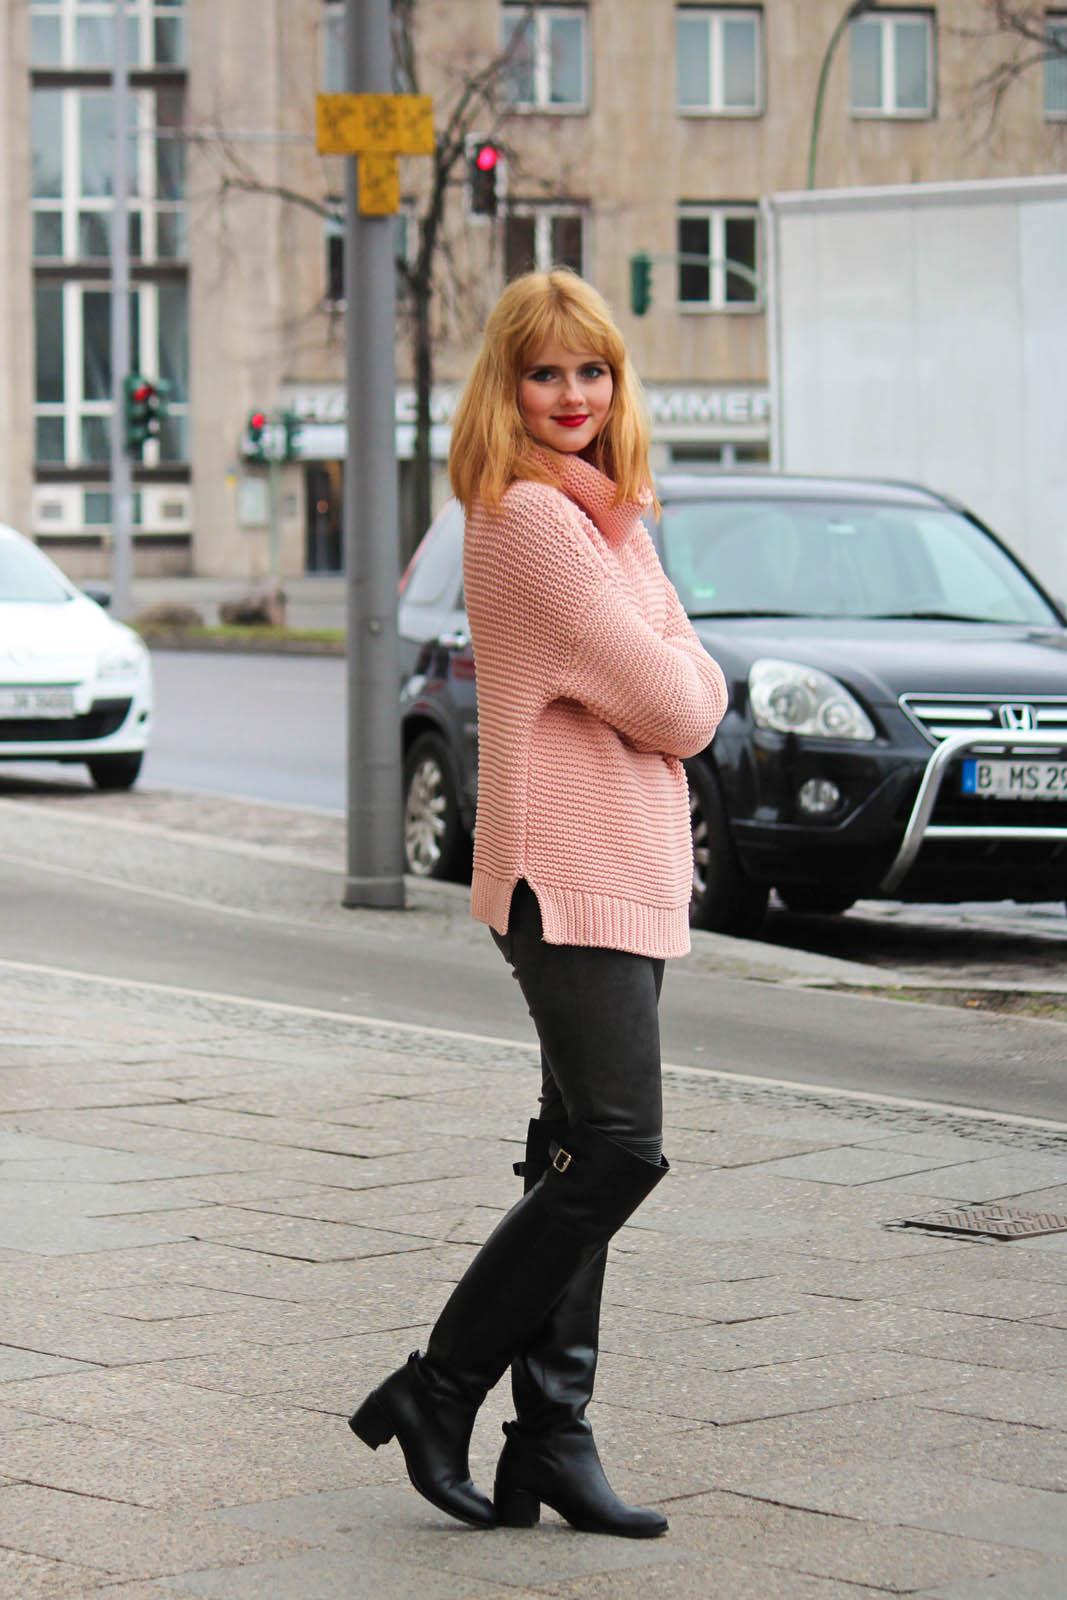 Berlin City Style - Turtleneck Sweater, Overknee Boots 4